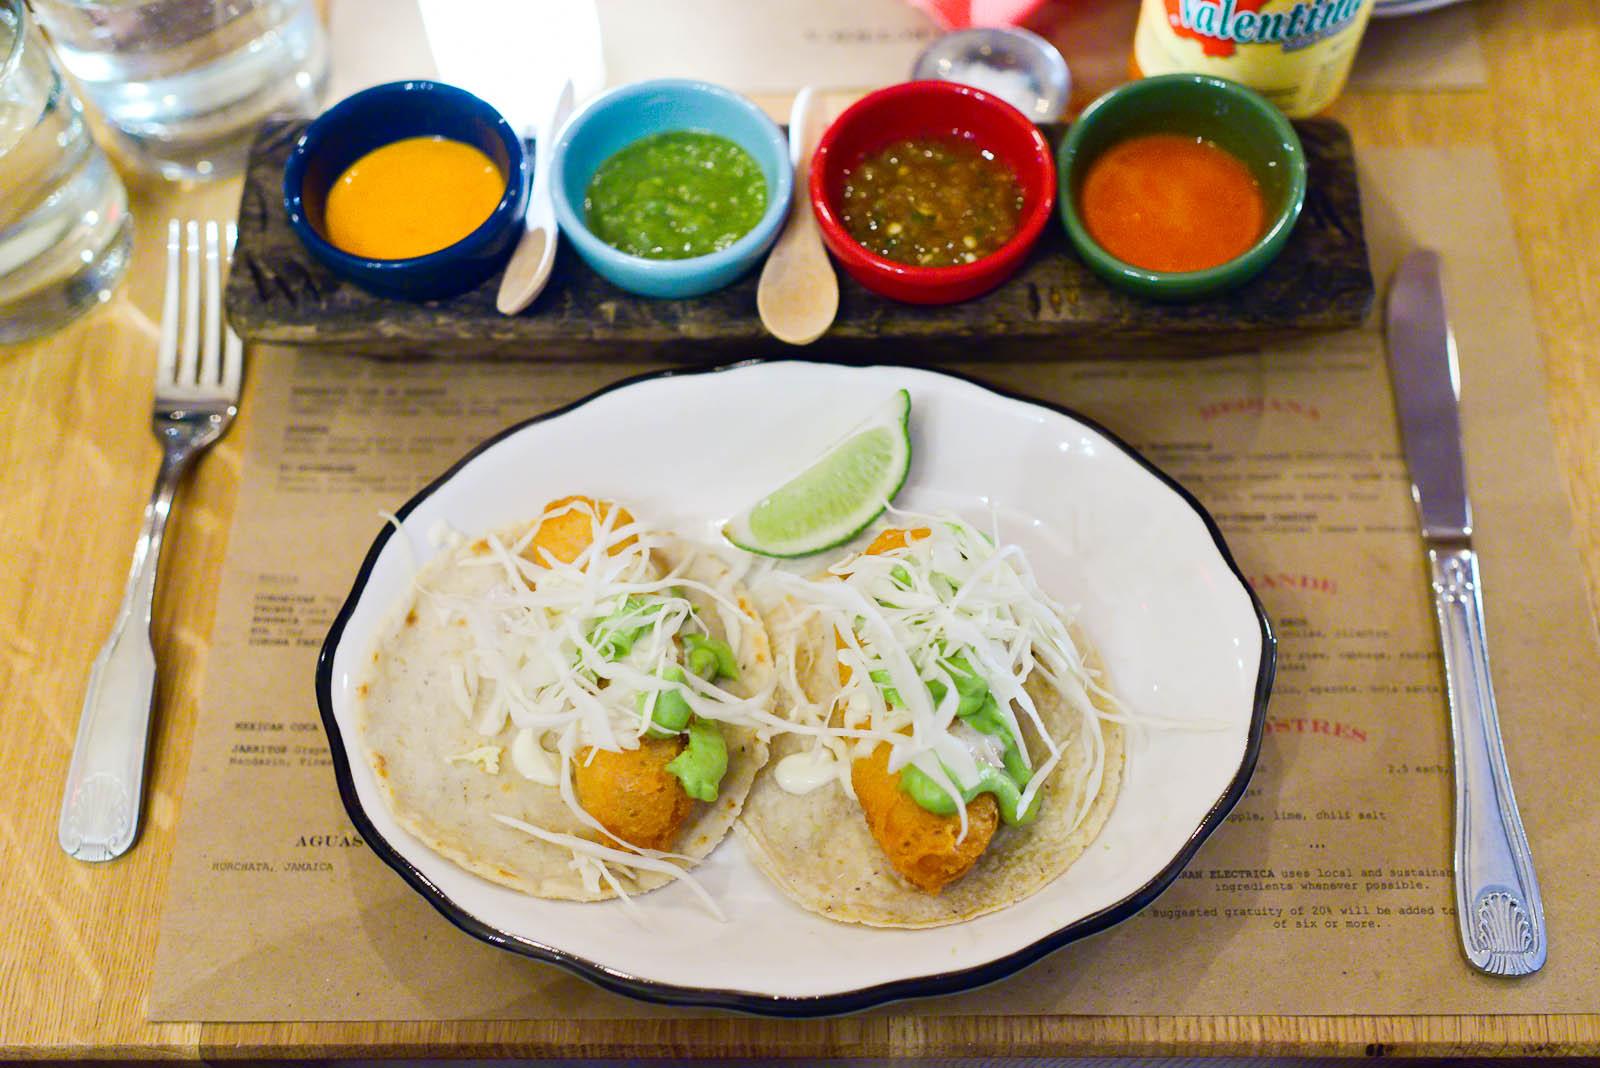 Tacos de pescado estilo ensenada - striped bass, cabbage, avocad